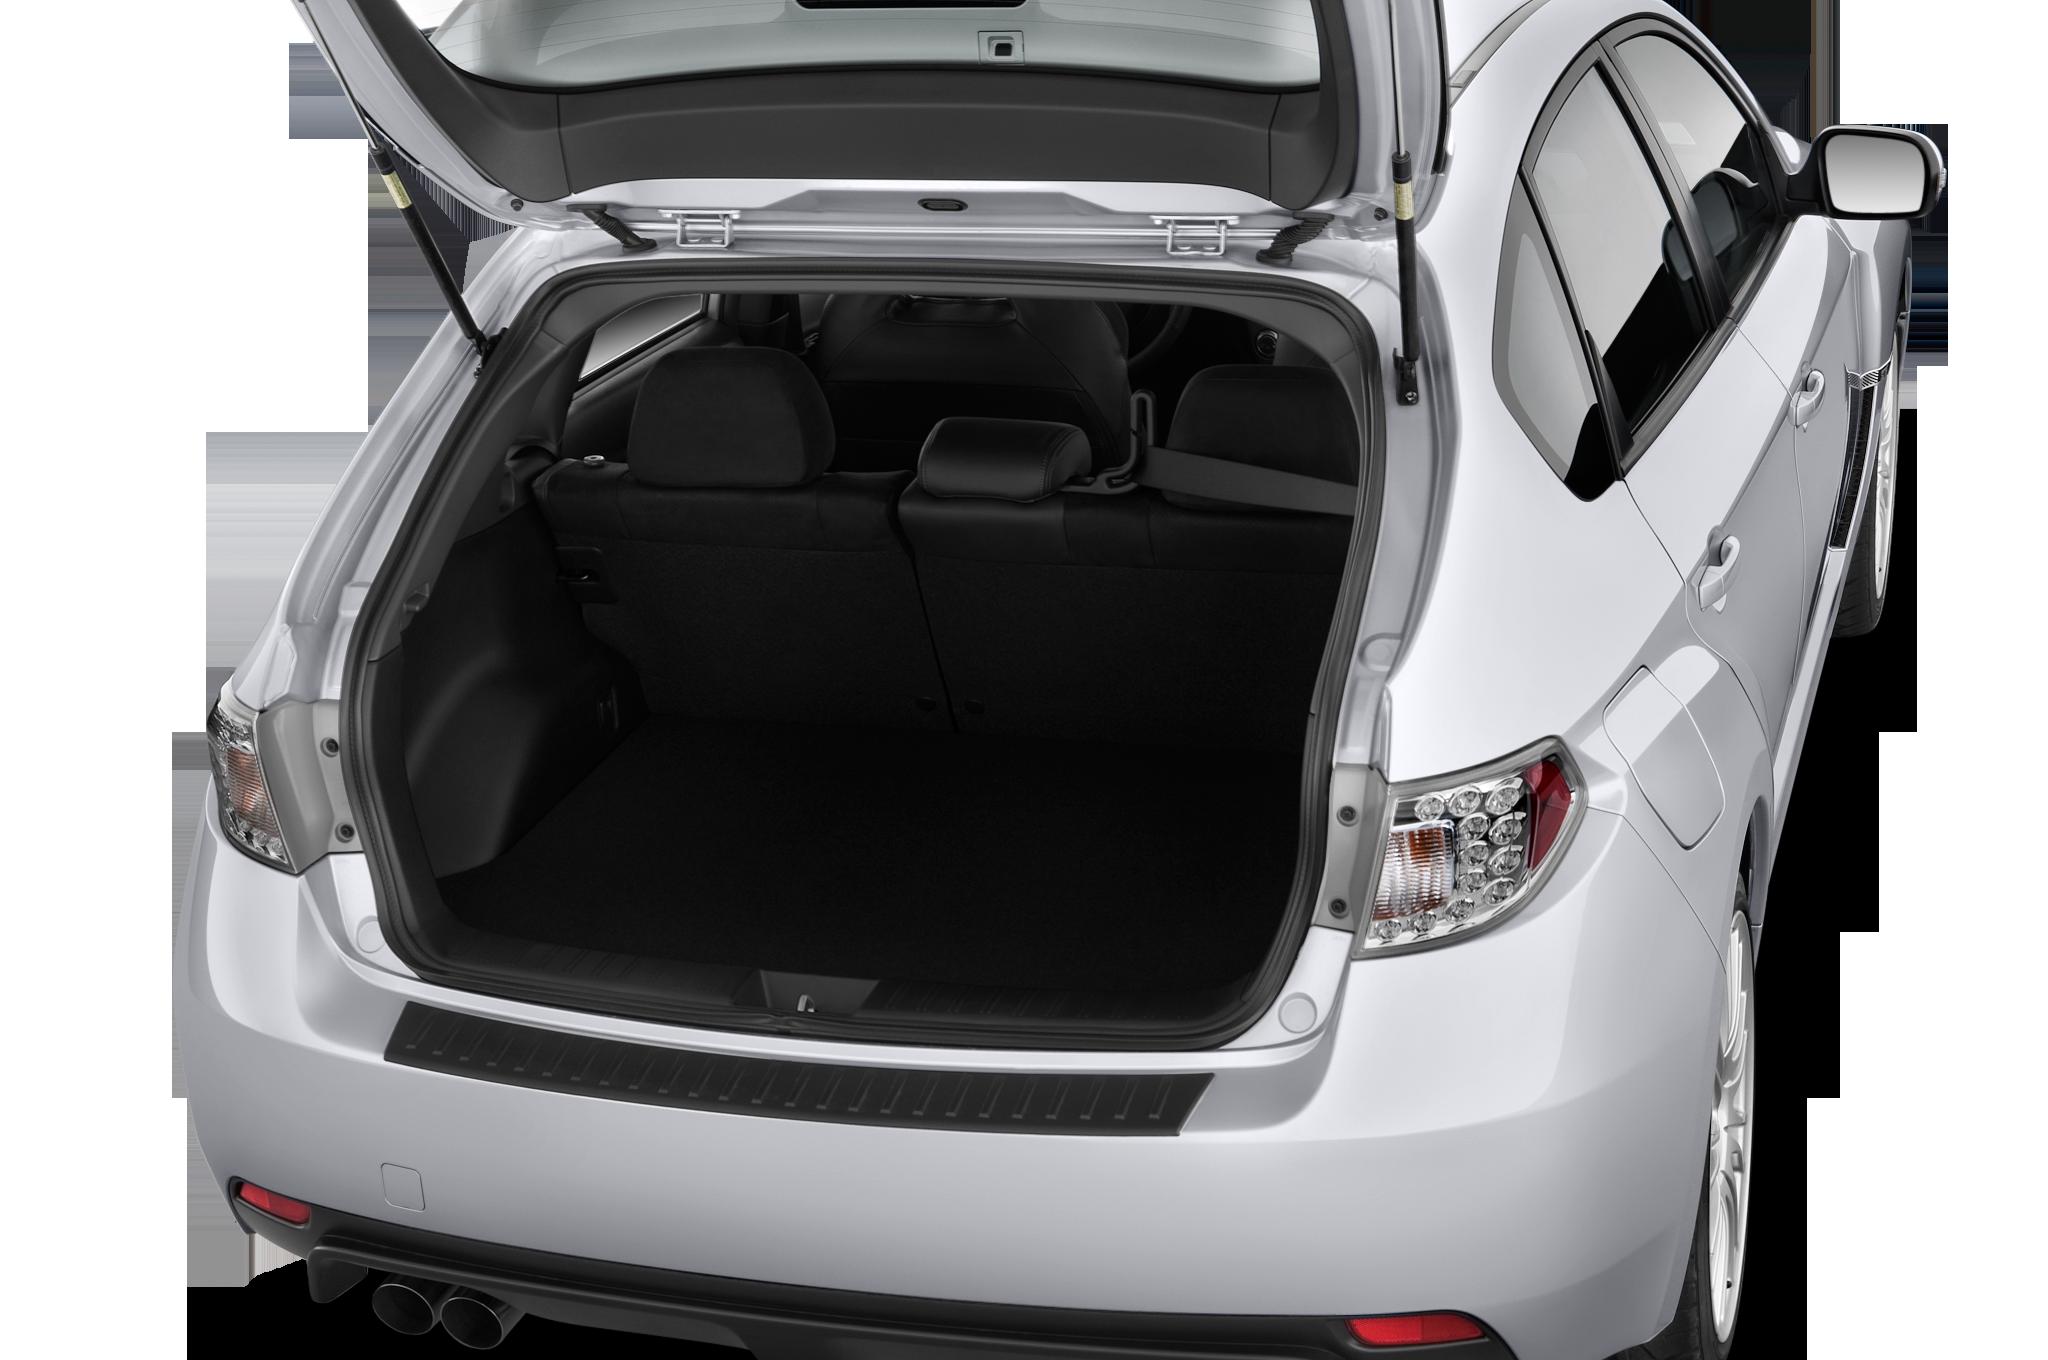 2010 subaru impreza premium subaru midsize sedan. Black Bedroom Furniture Sets. Home Design Ideas